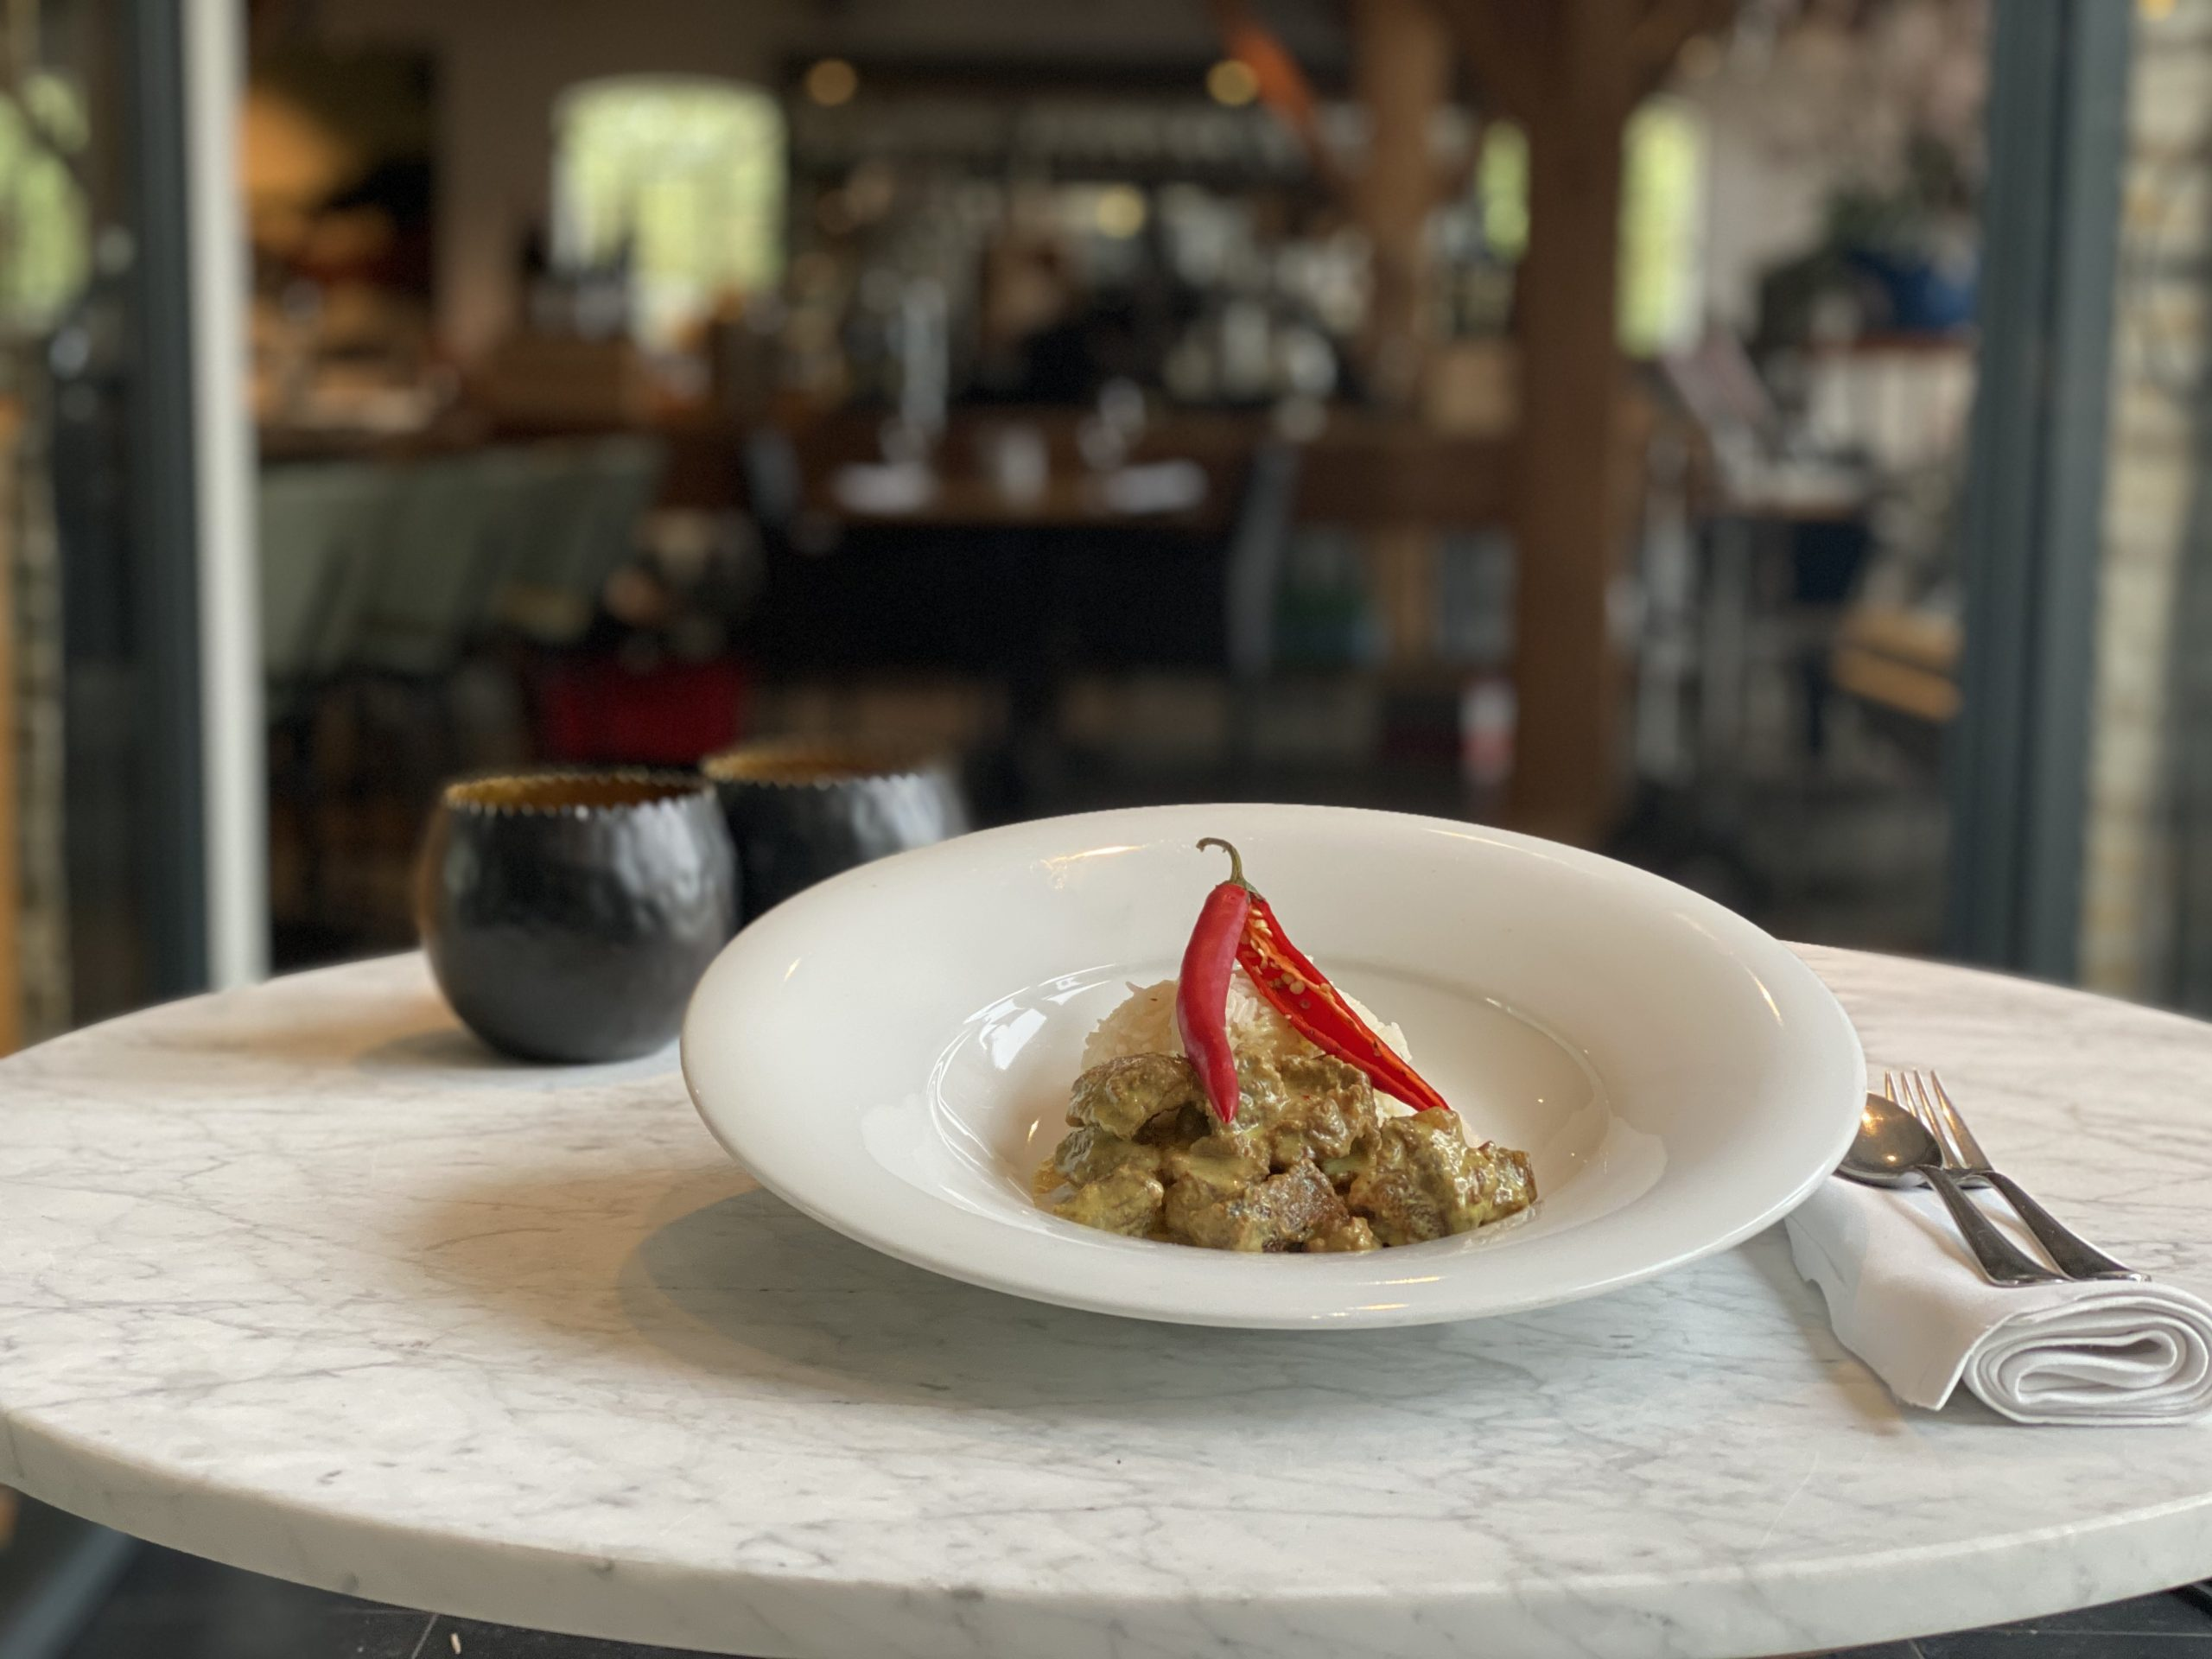 Beef Curry | Bavette Farmshop | Maasland | Online shoppen | Boerderij | Traiteur | Vlees van eigen weide | Home made for you |